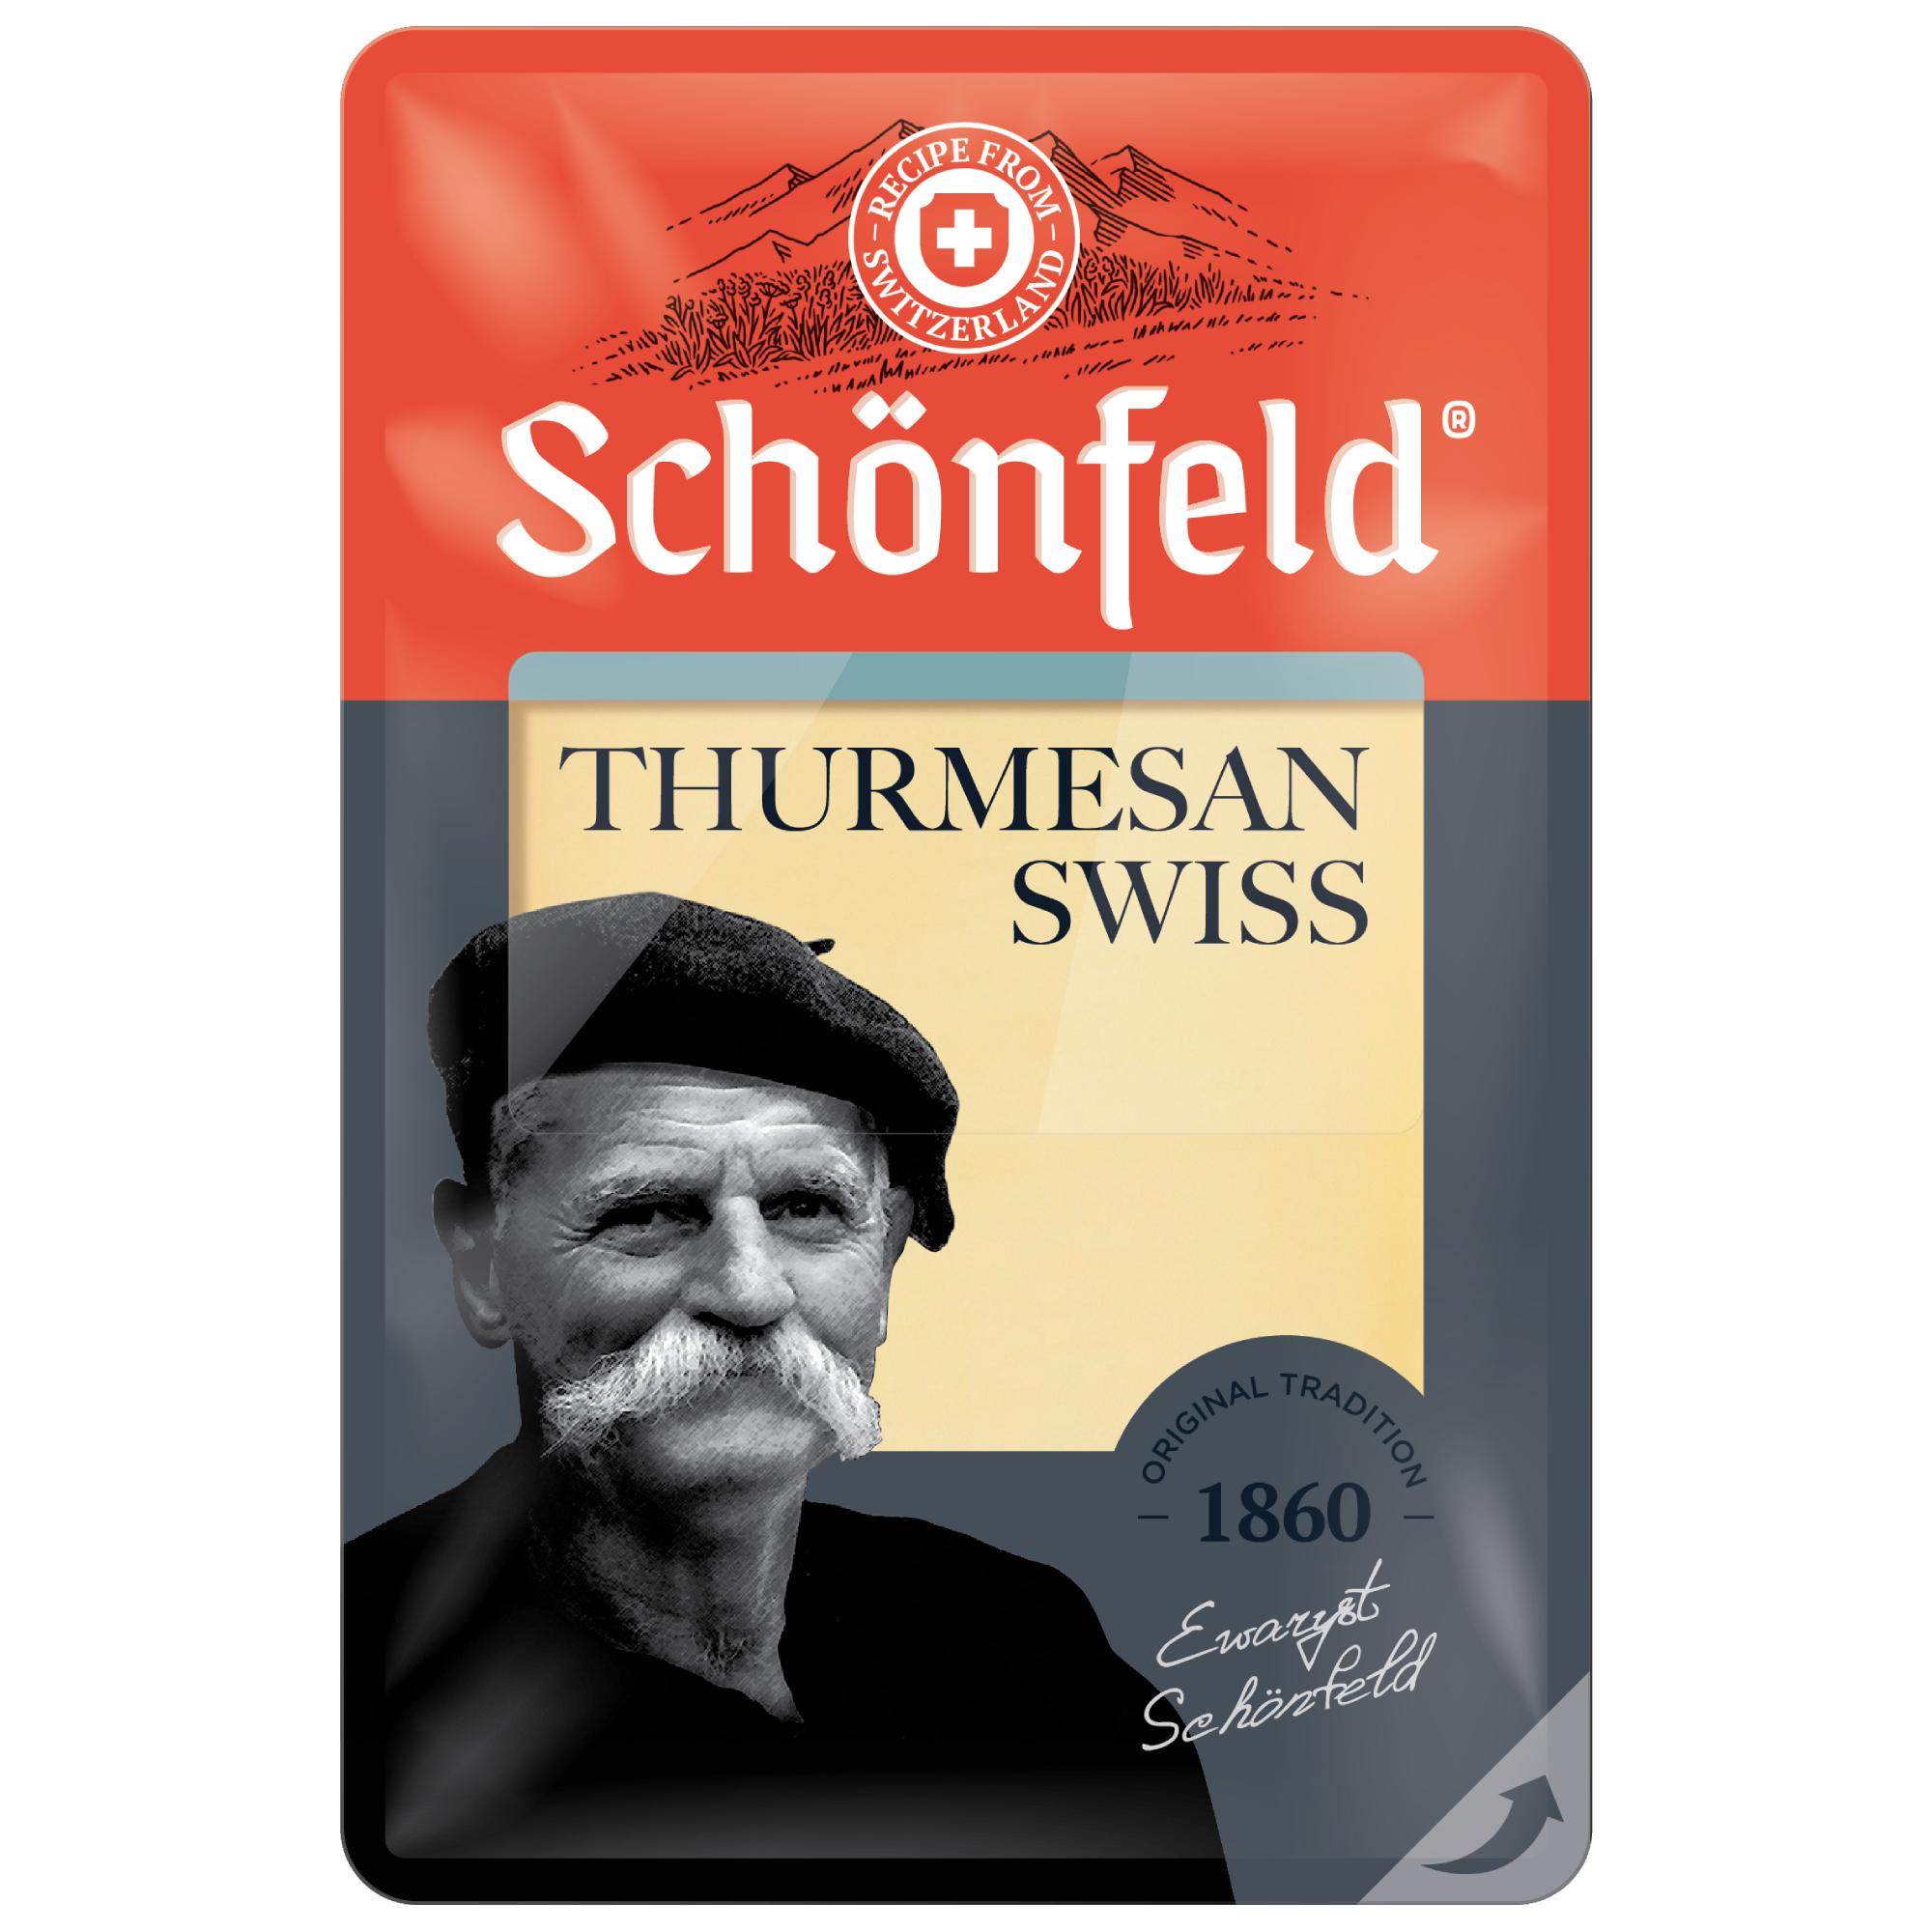 Фото - Сыр Schonfeld Swiss Thurmesan нарезка 52% 125 г сыр полутвердый schonfeld тильзитер нарезка 45